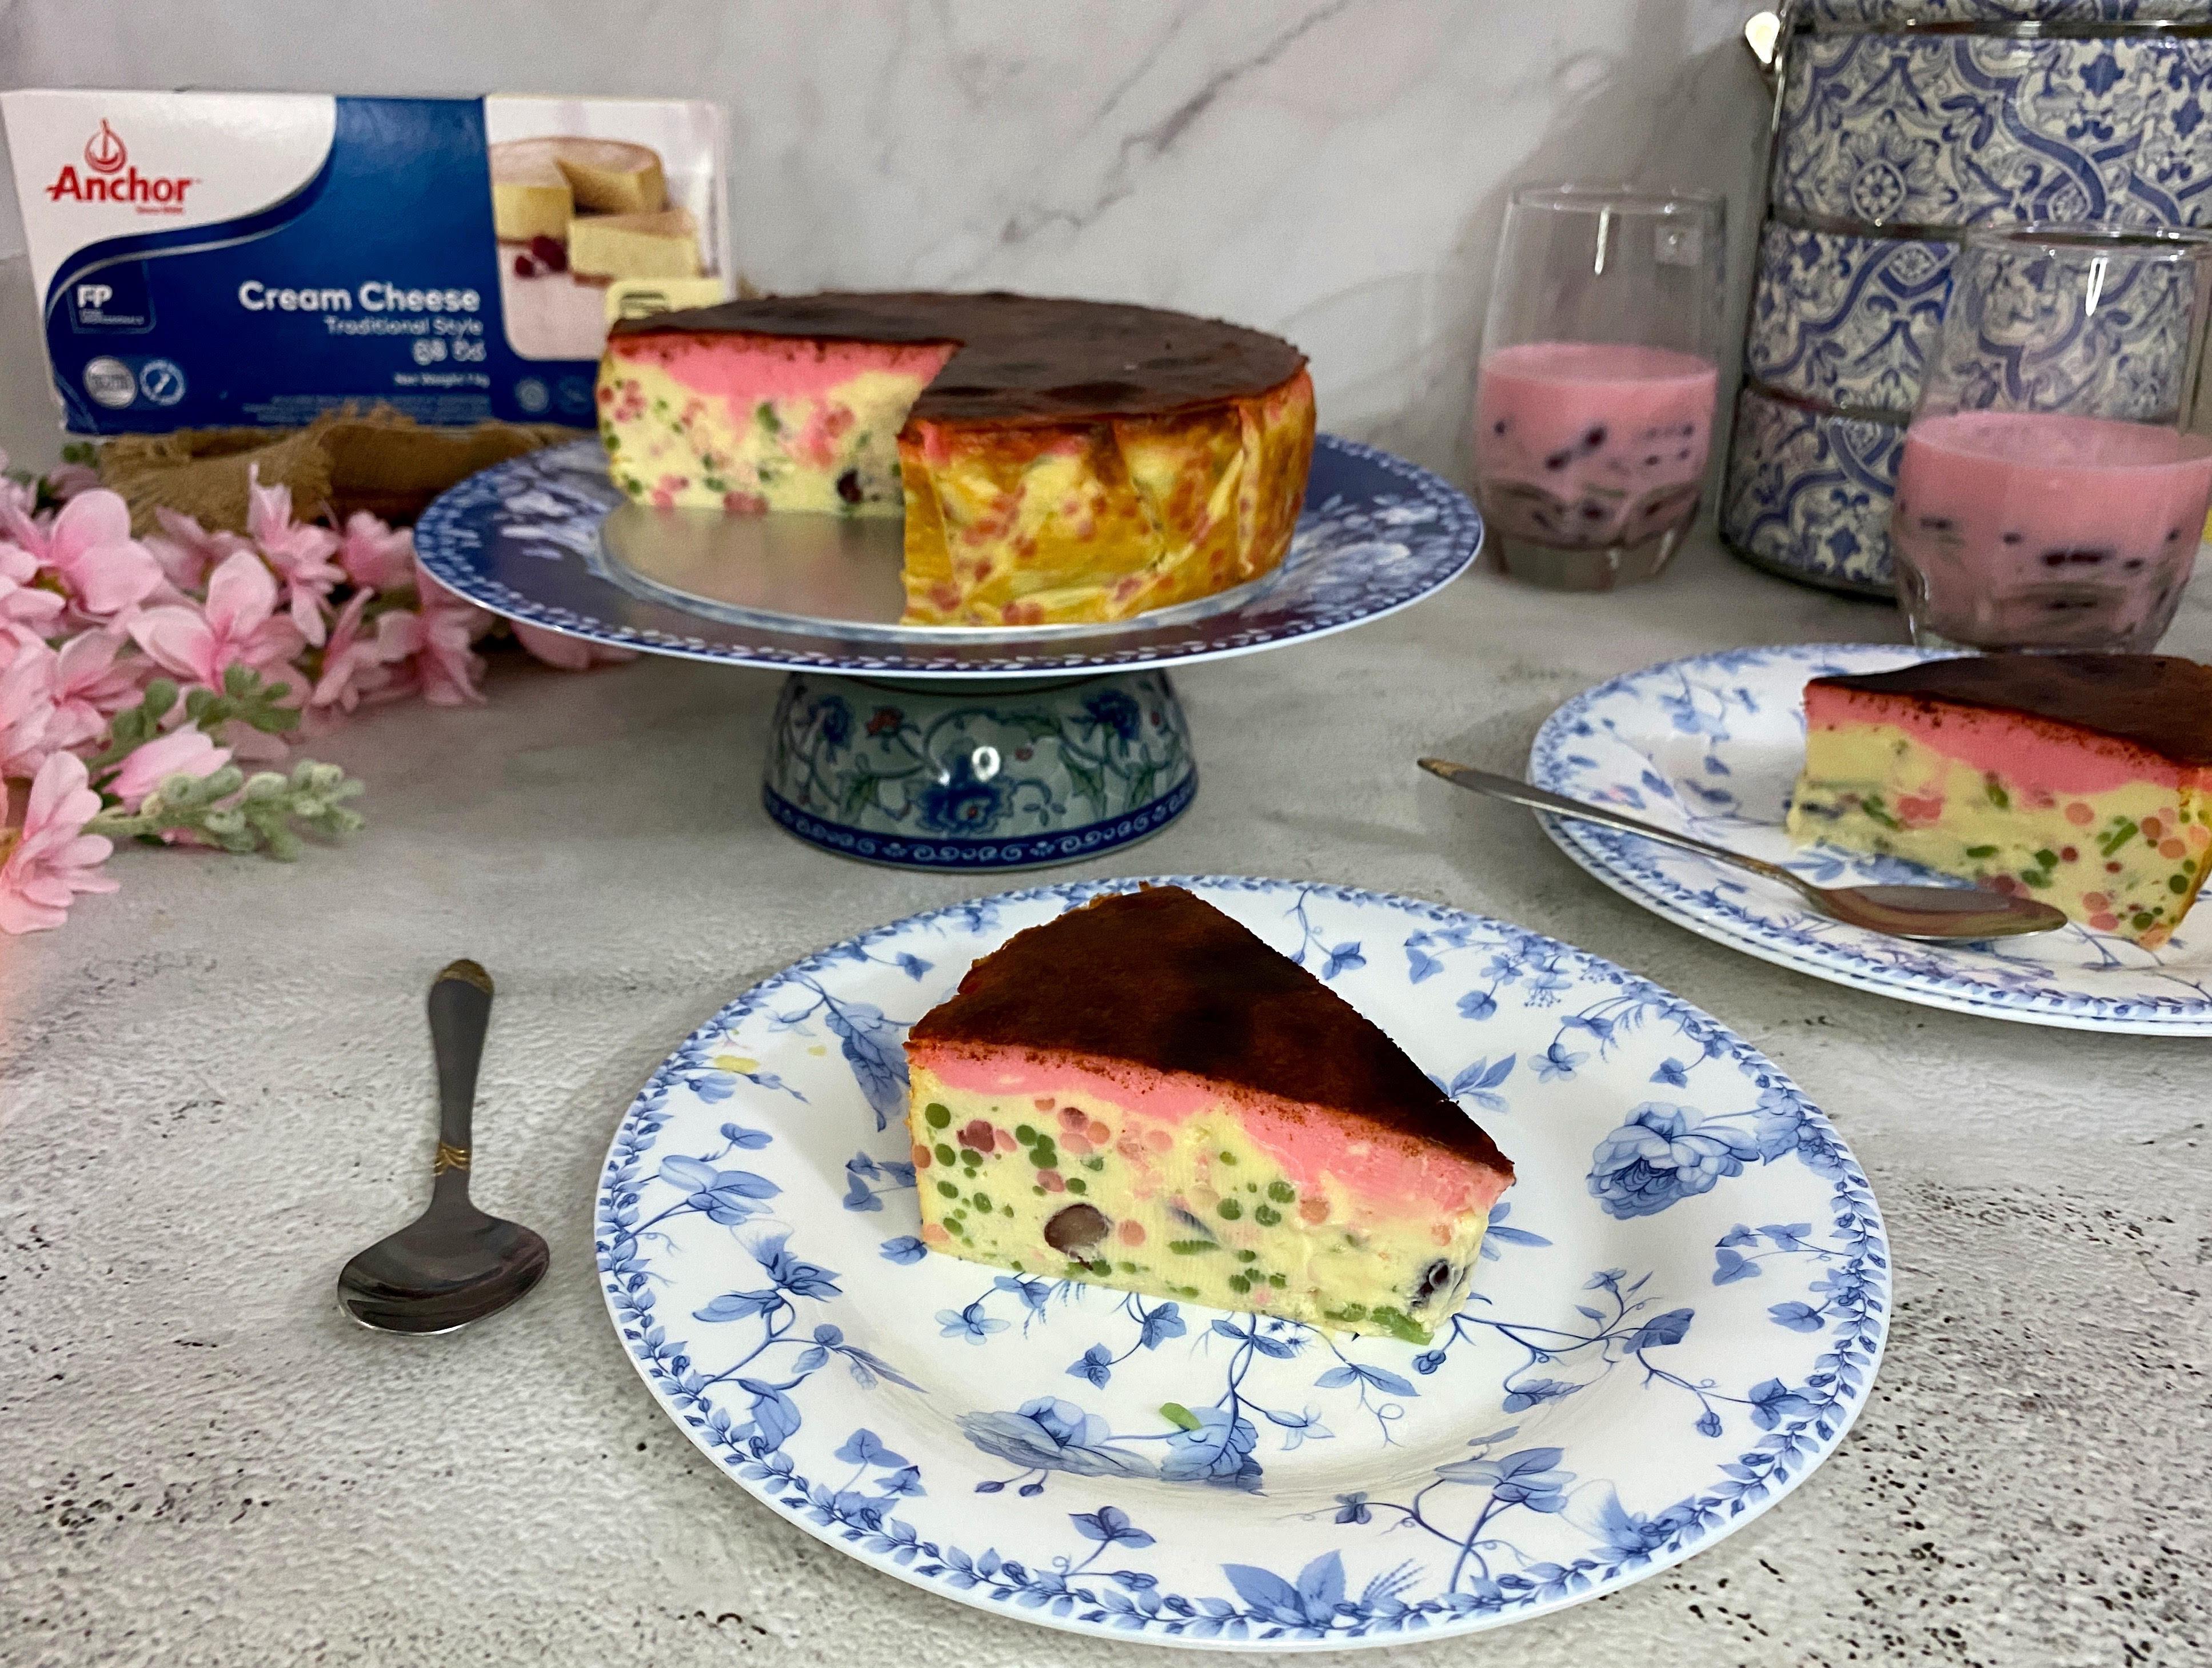 Bandung ABC Cheesecake